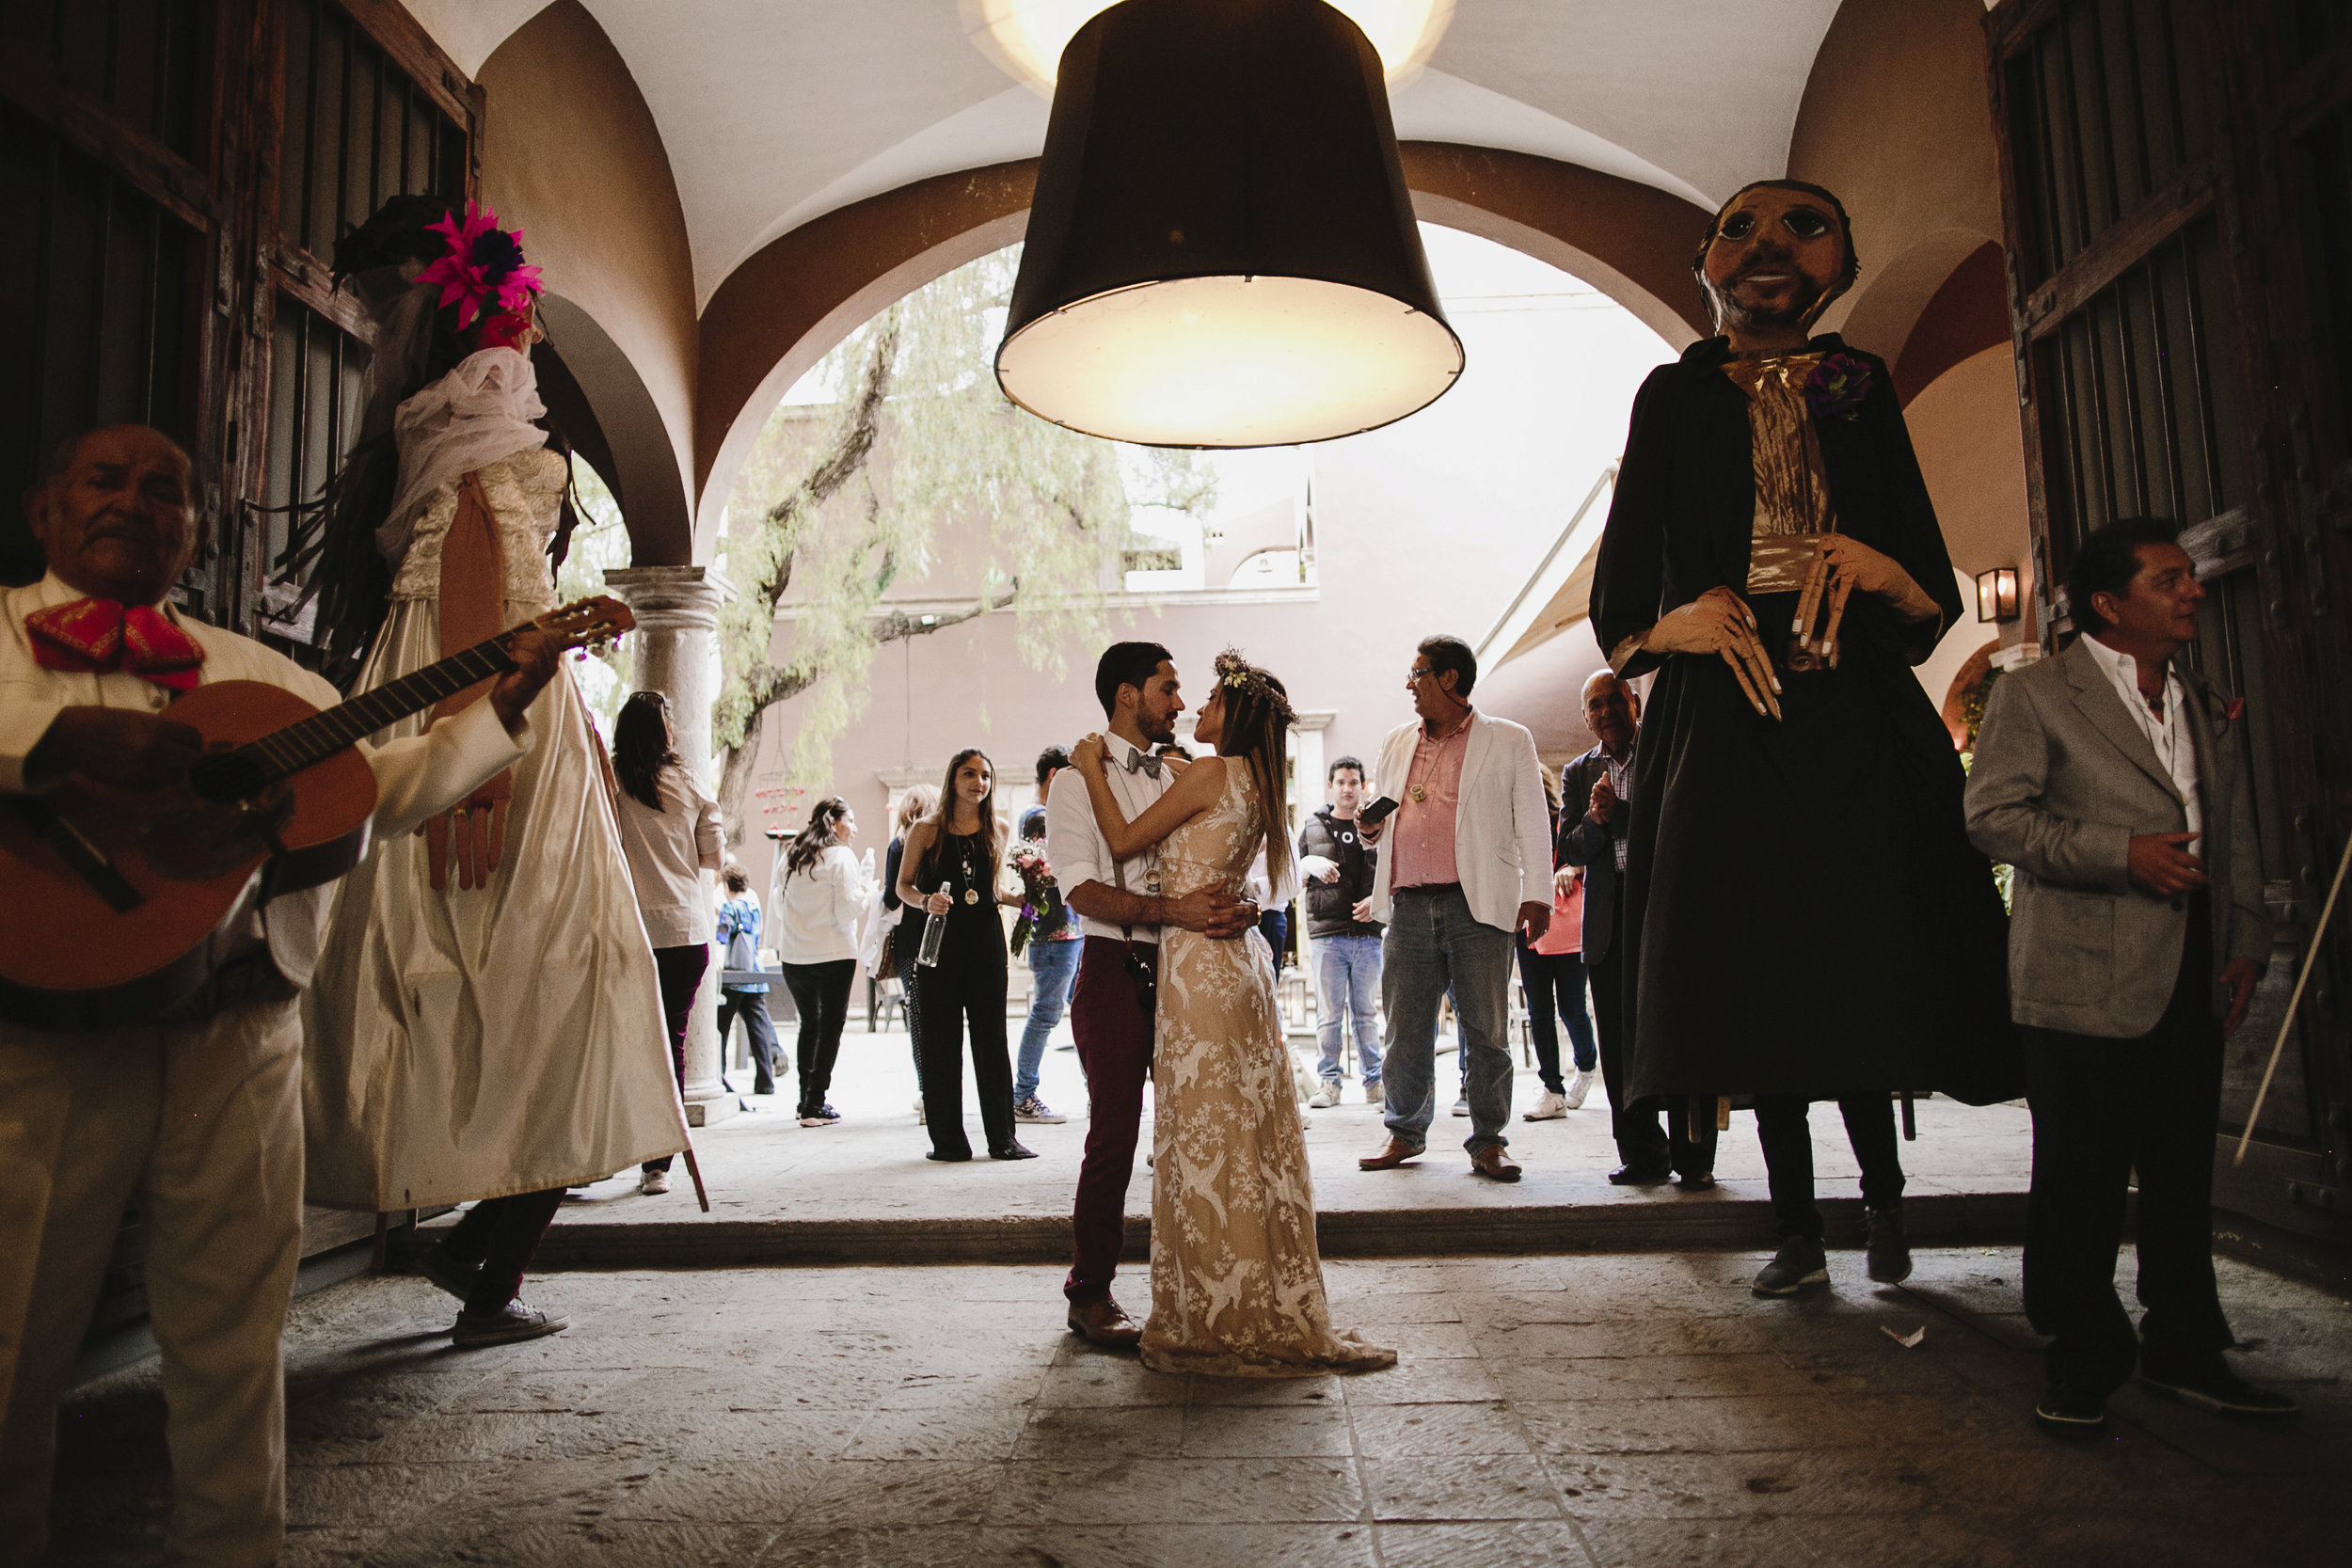 alfons_flores_destination_wedding_photography_mavi_david-469.JPG